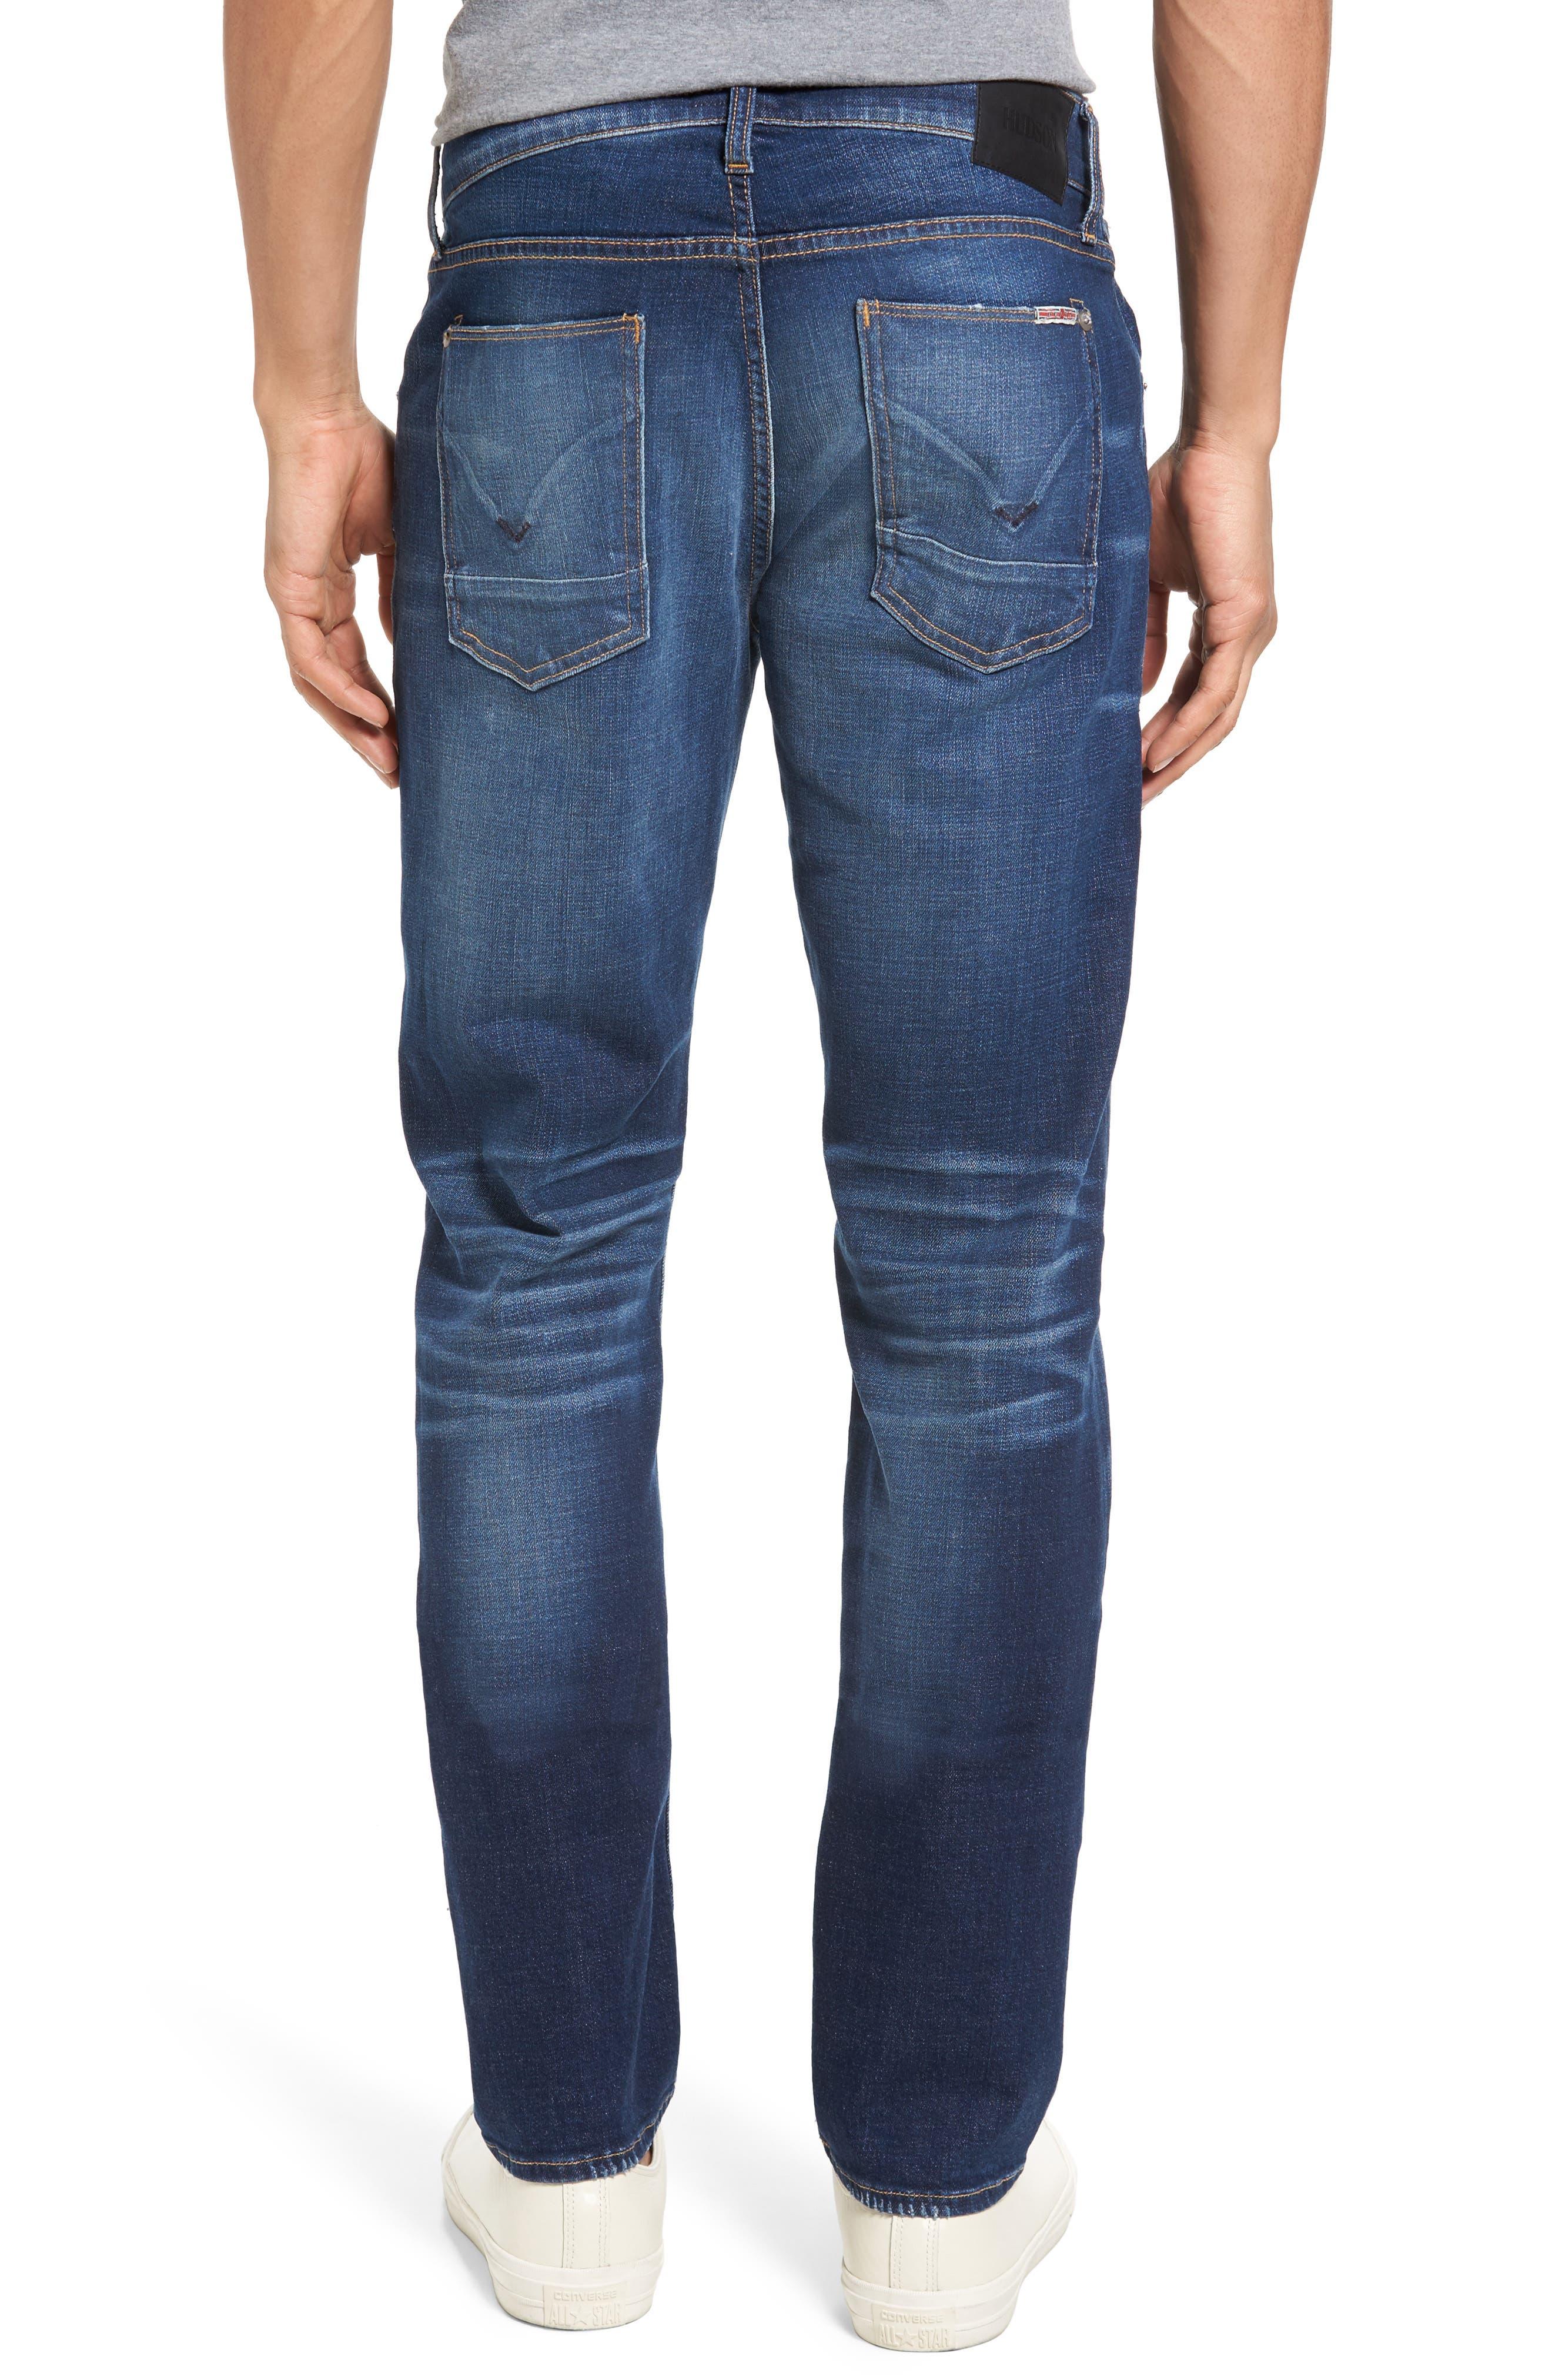 Blake Slim Fit Jeans,                             Alternate thumbnail 2, color,                             Genuine